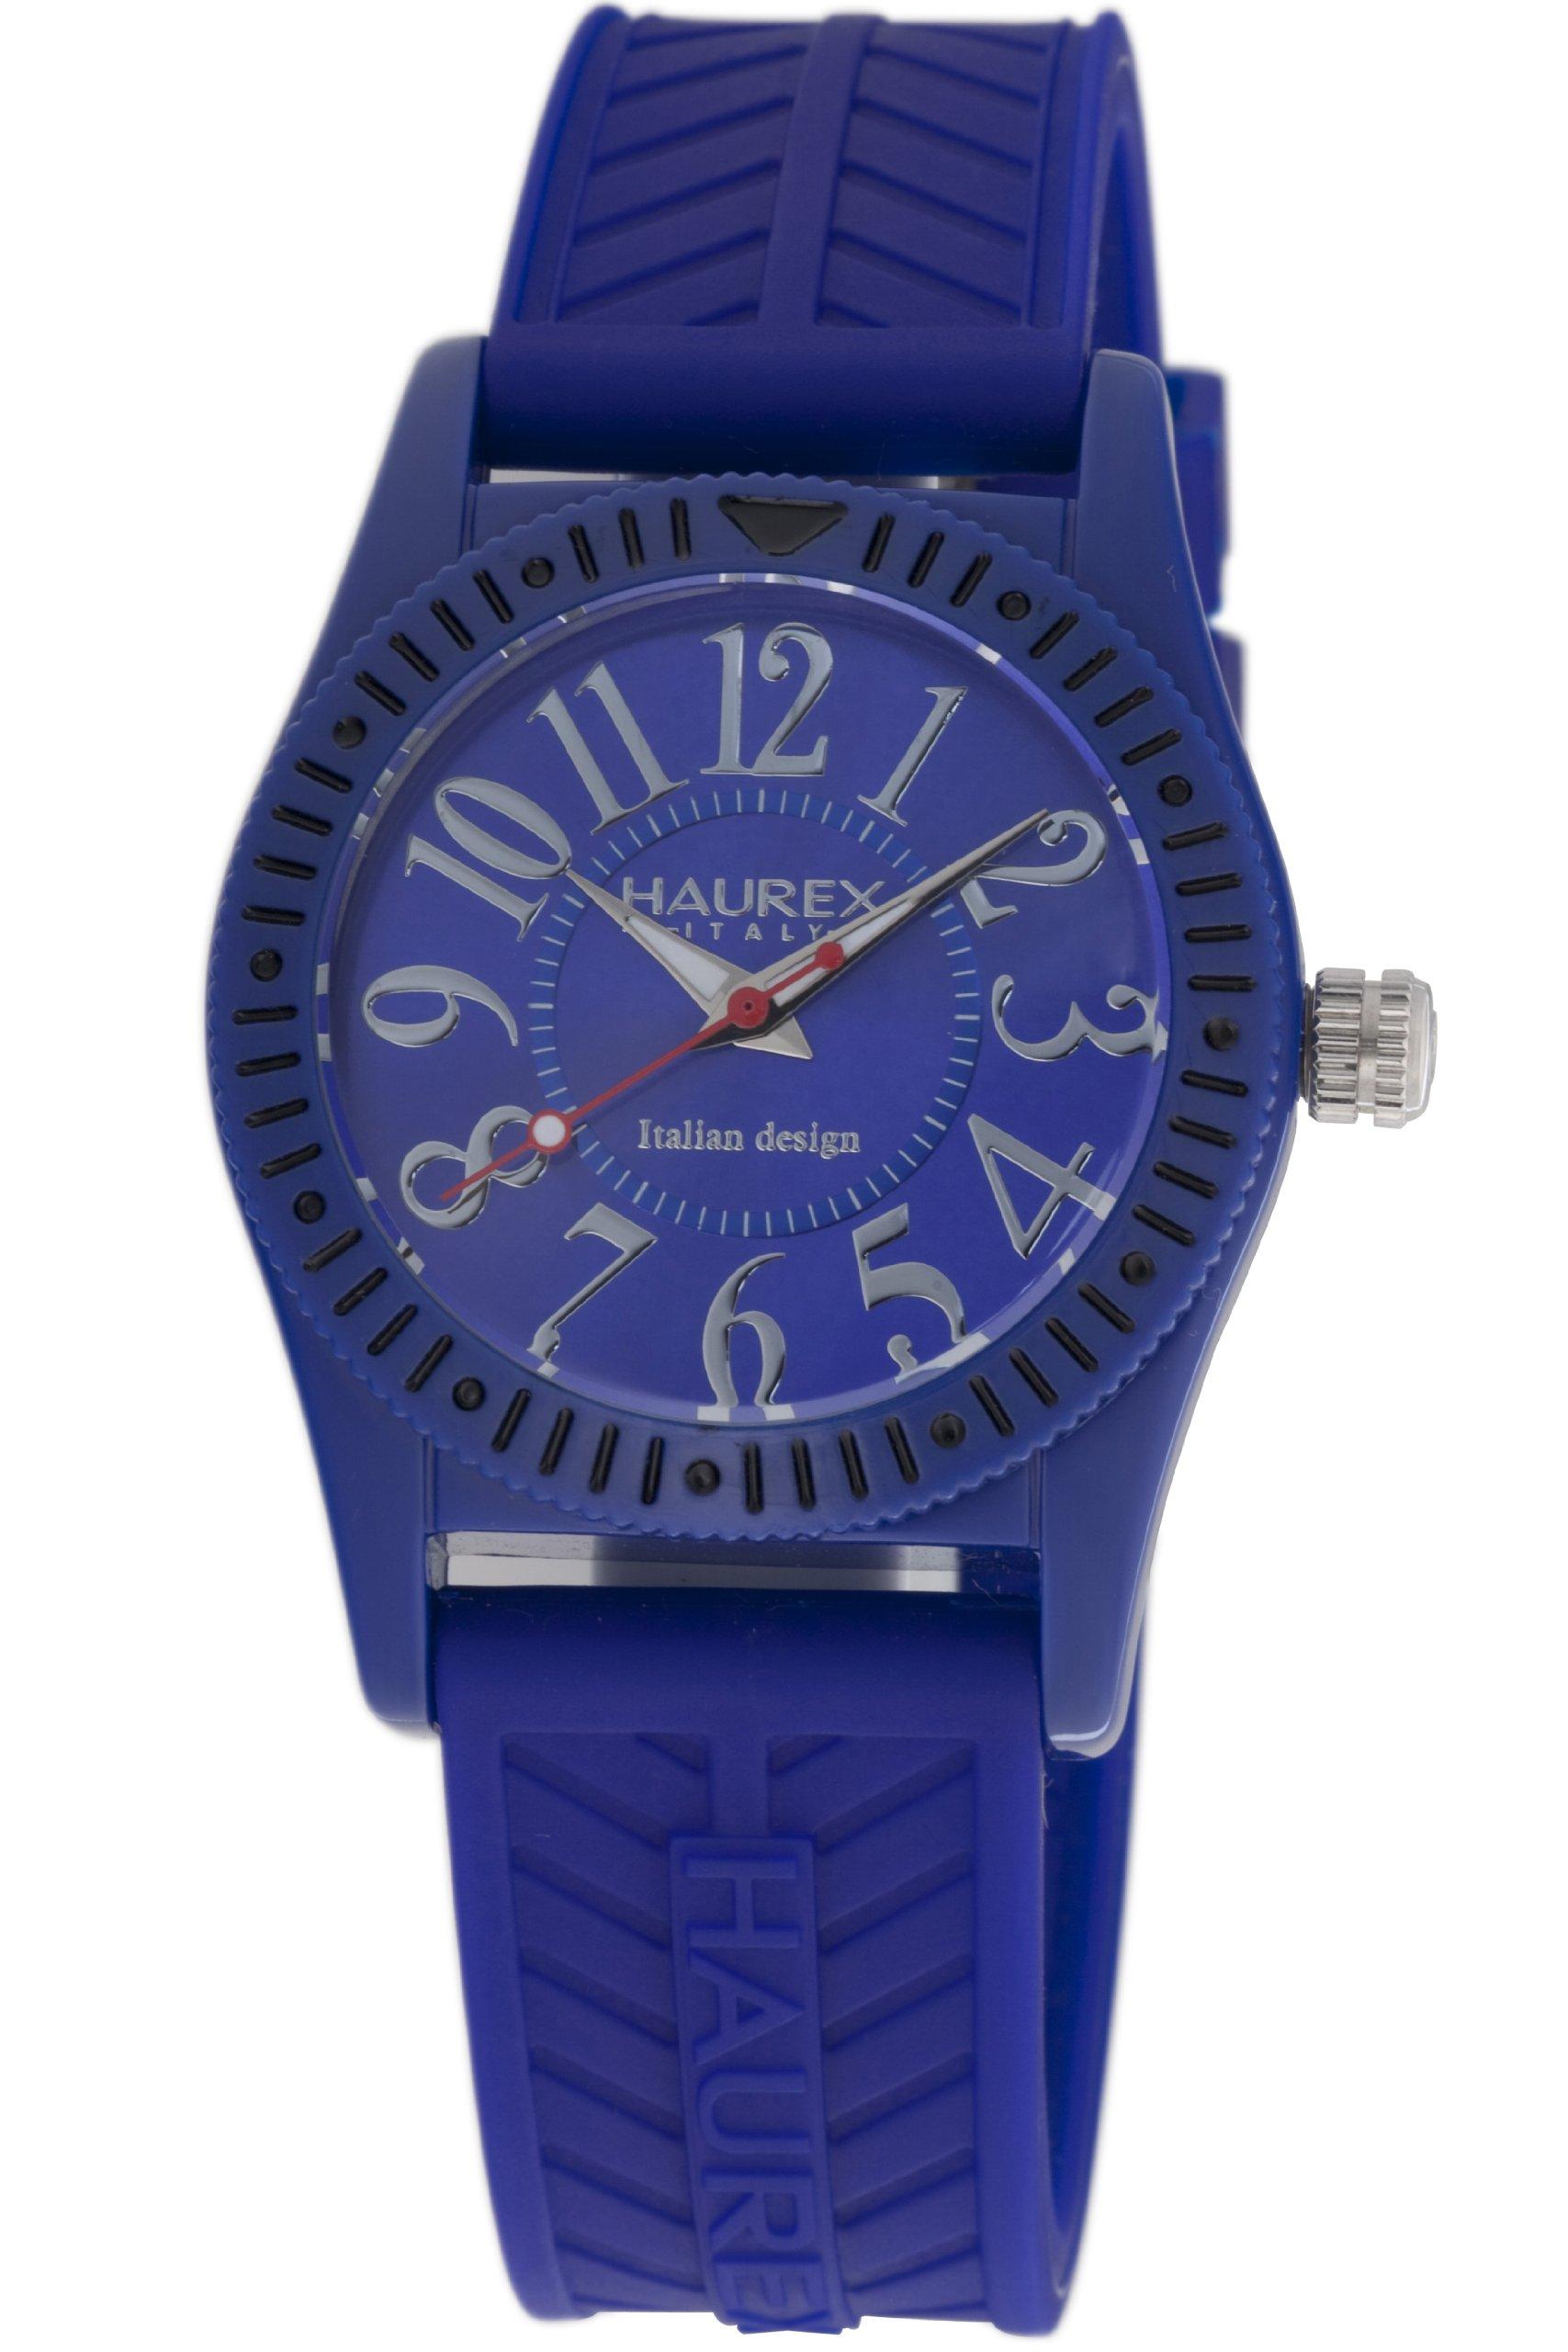 Haurex Italy Kids' PB331UB1 Promise B PC Blue Dial Watch by HAUREX (Image #1)